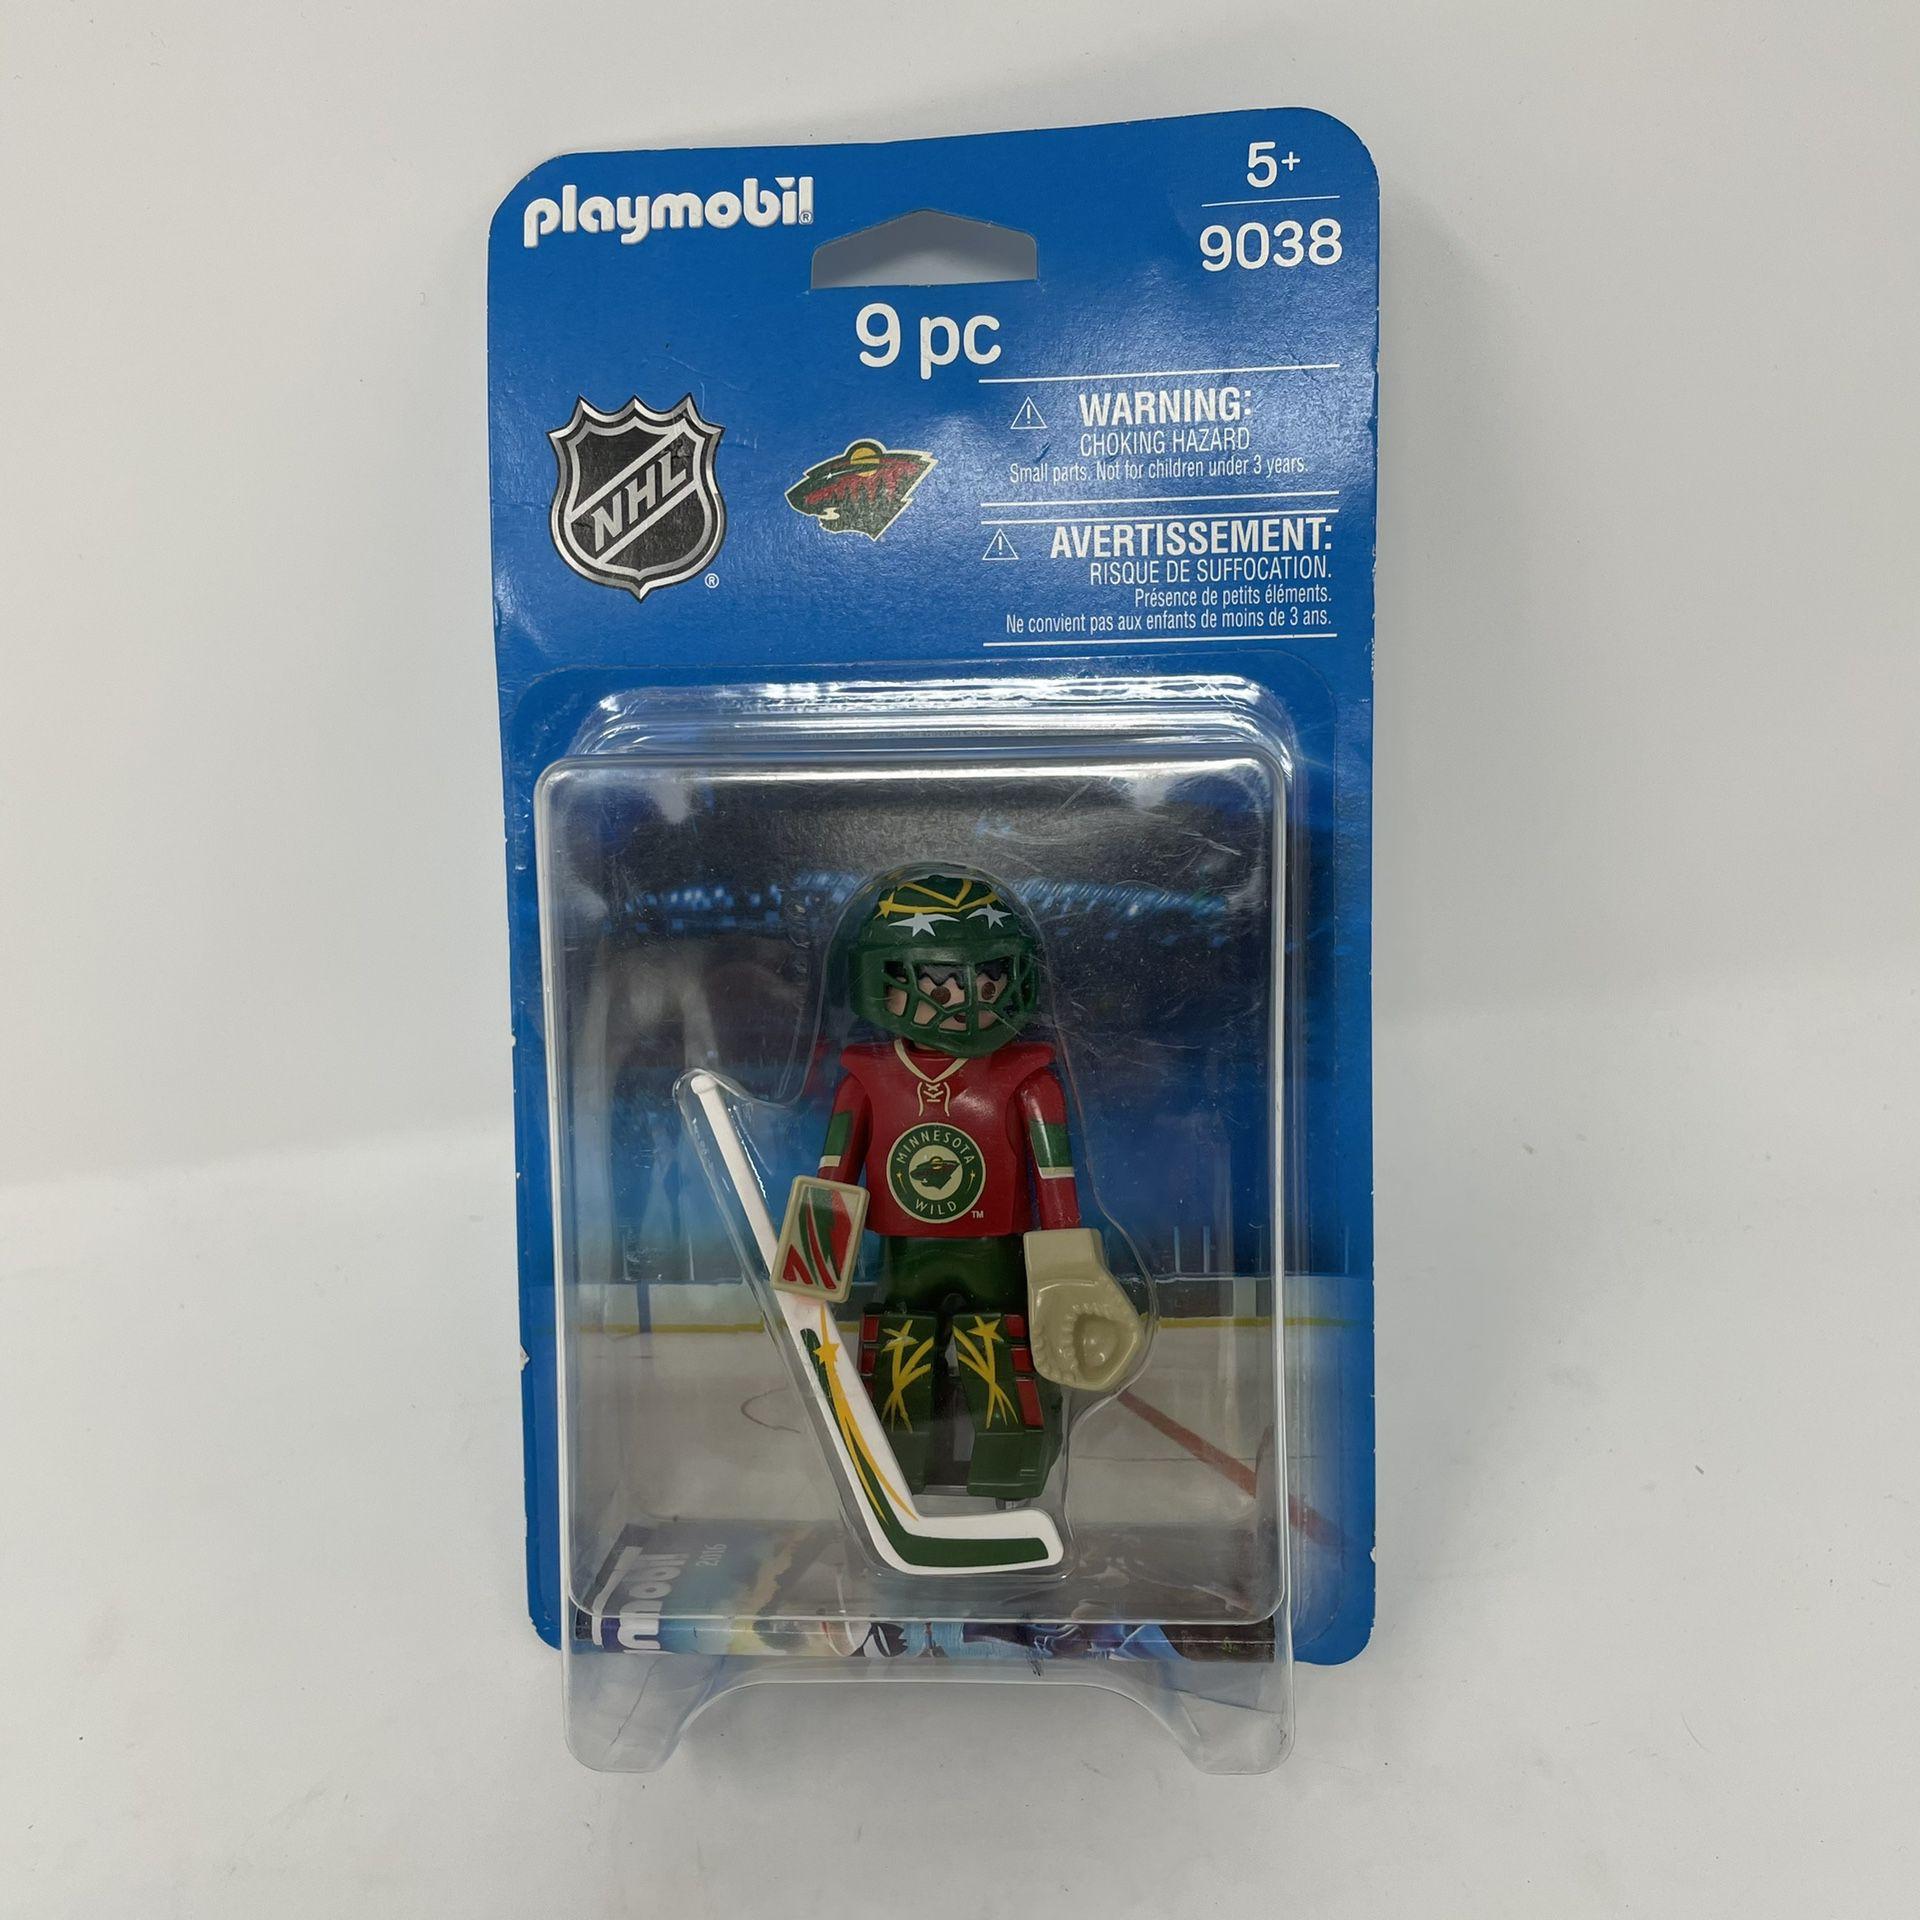 Playmobil NHL Minnesota Wild Goalie 9038